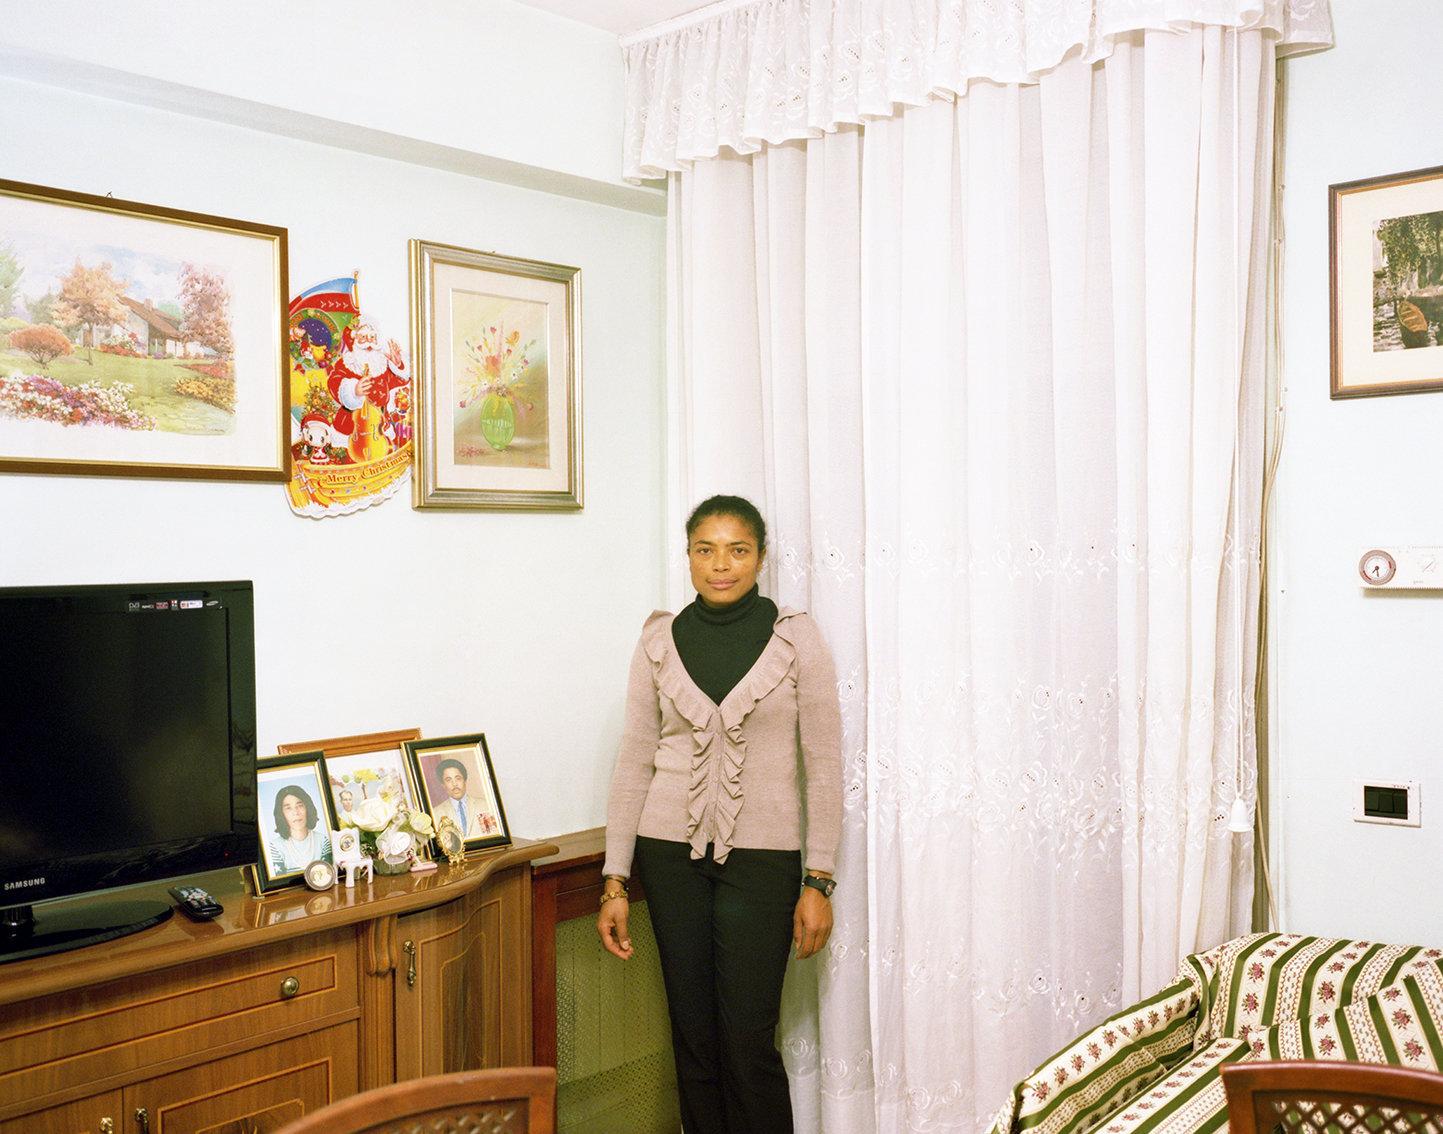 46_Antonia (Home) - You're Welcome 72.jpg